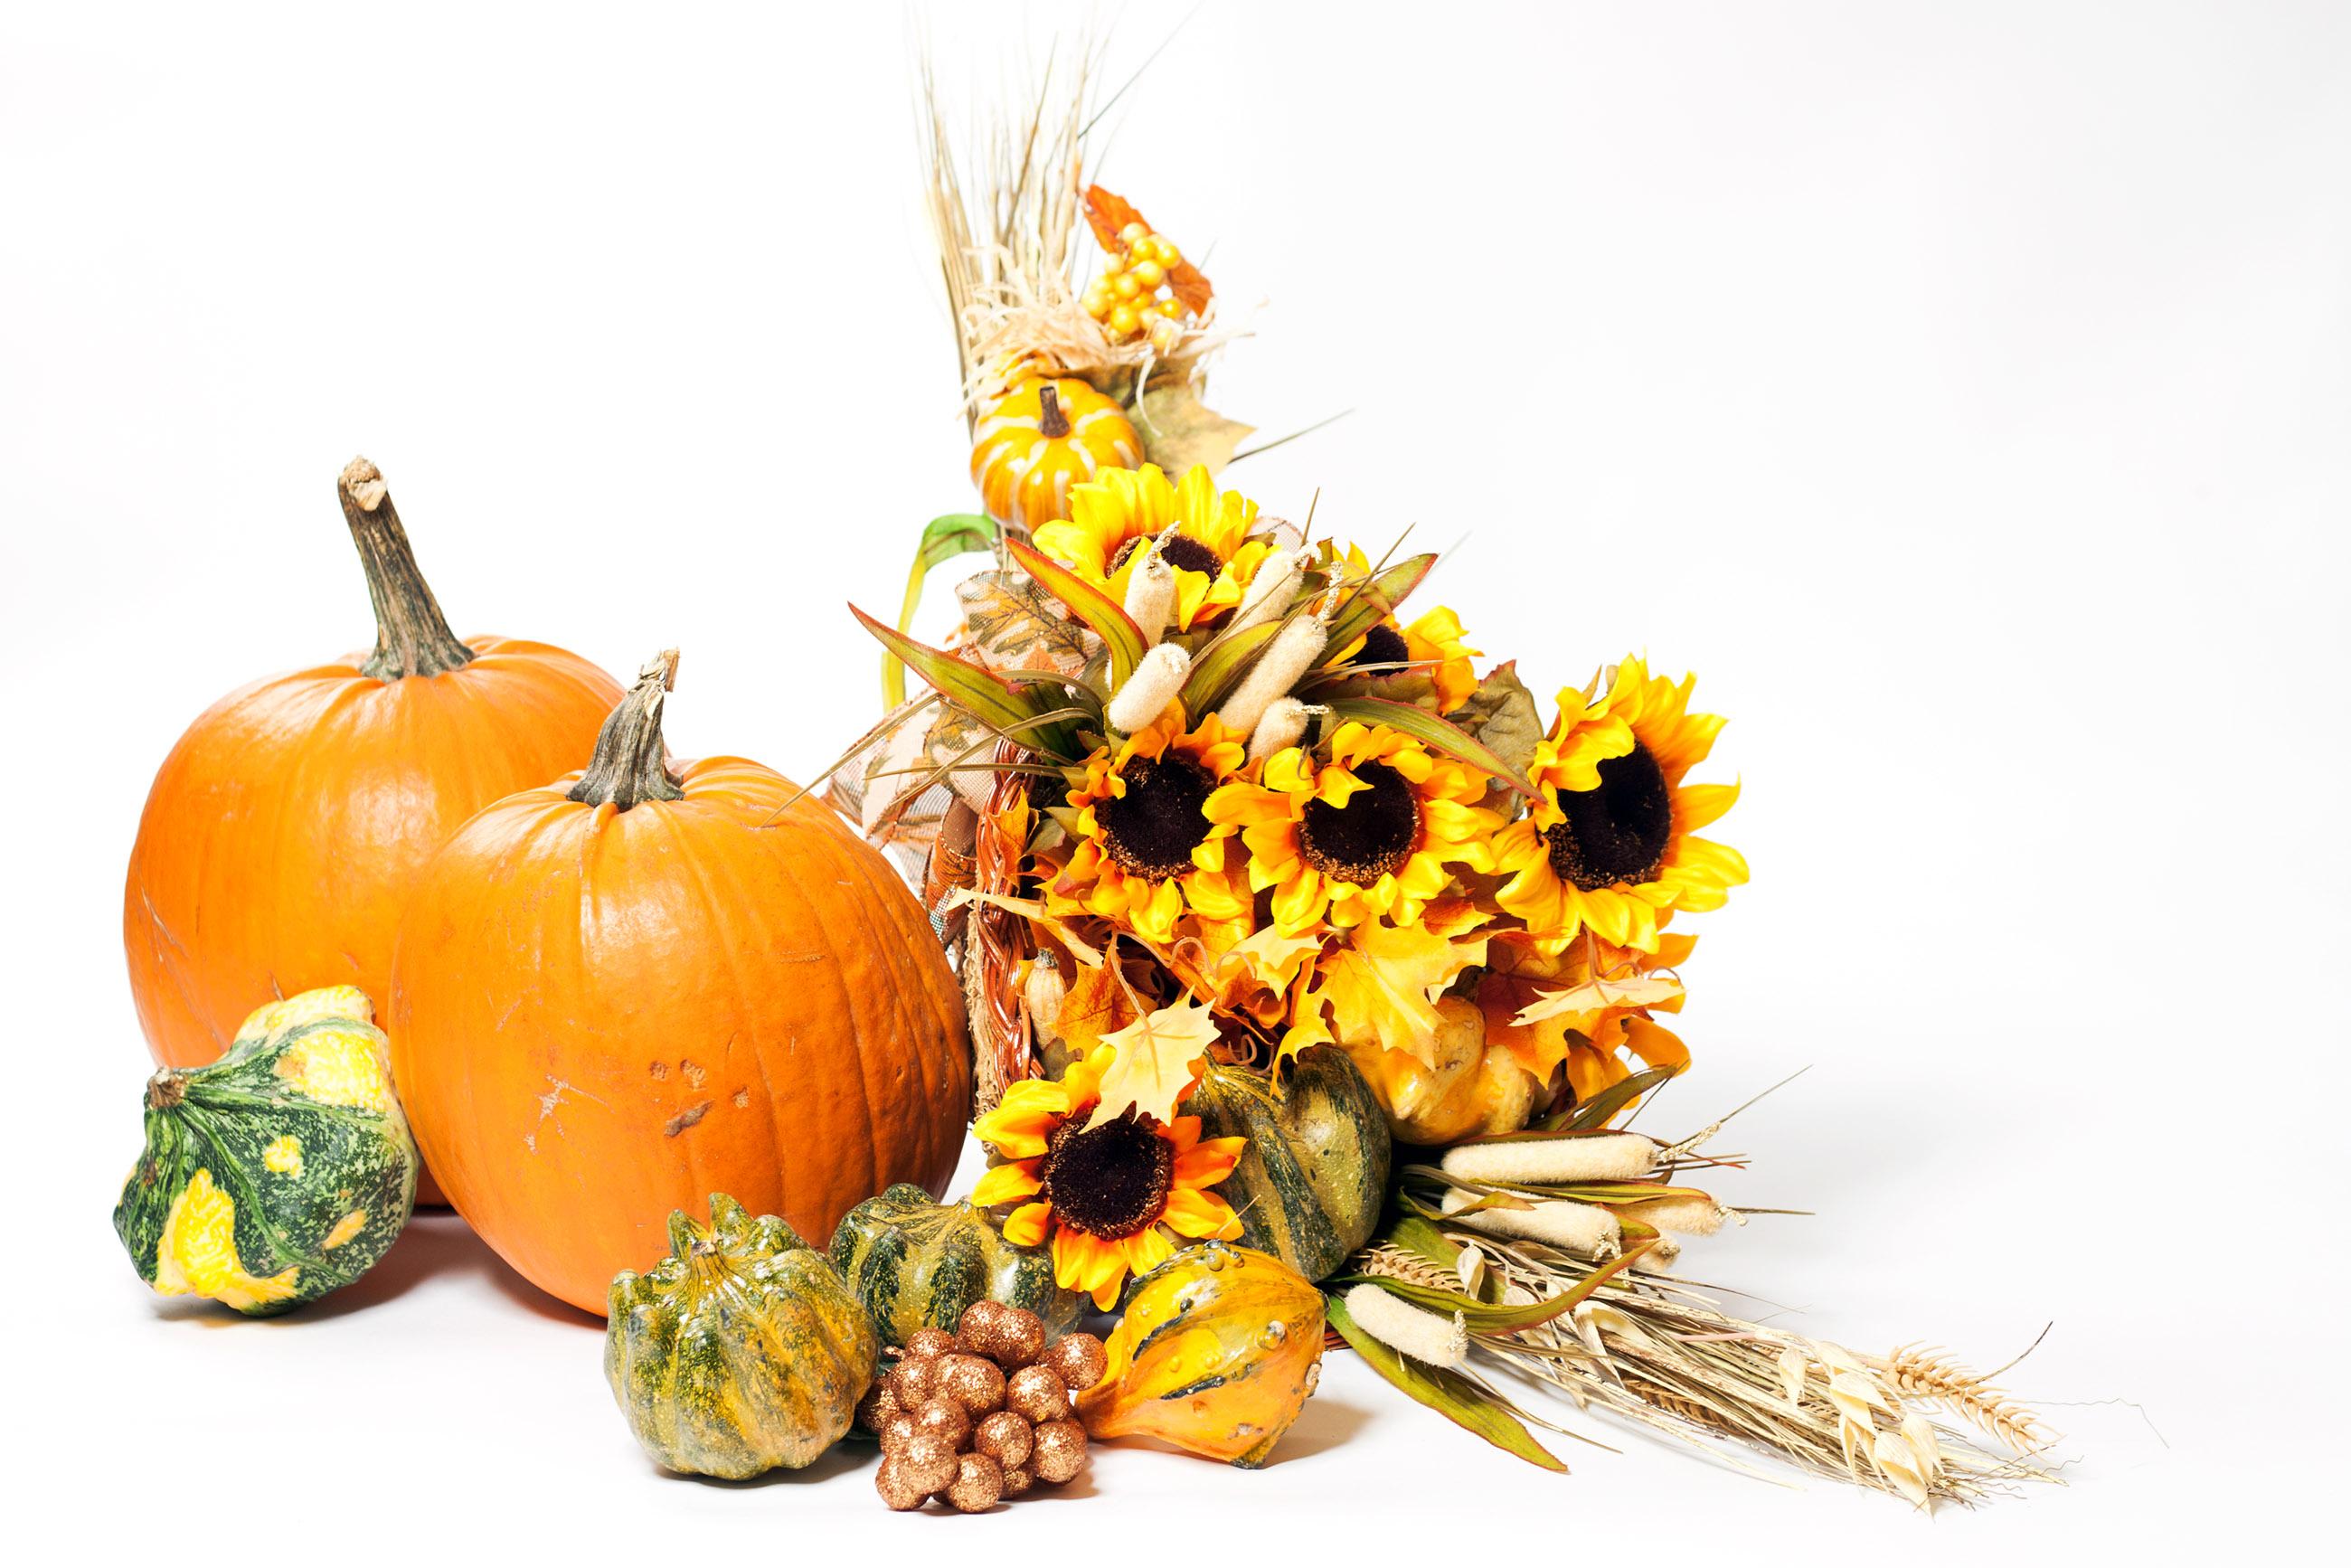 Fall cornucopia on a White background, Harvest, Vegetable, Thanksgiving, Seasons, HQ Photo